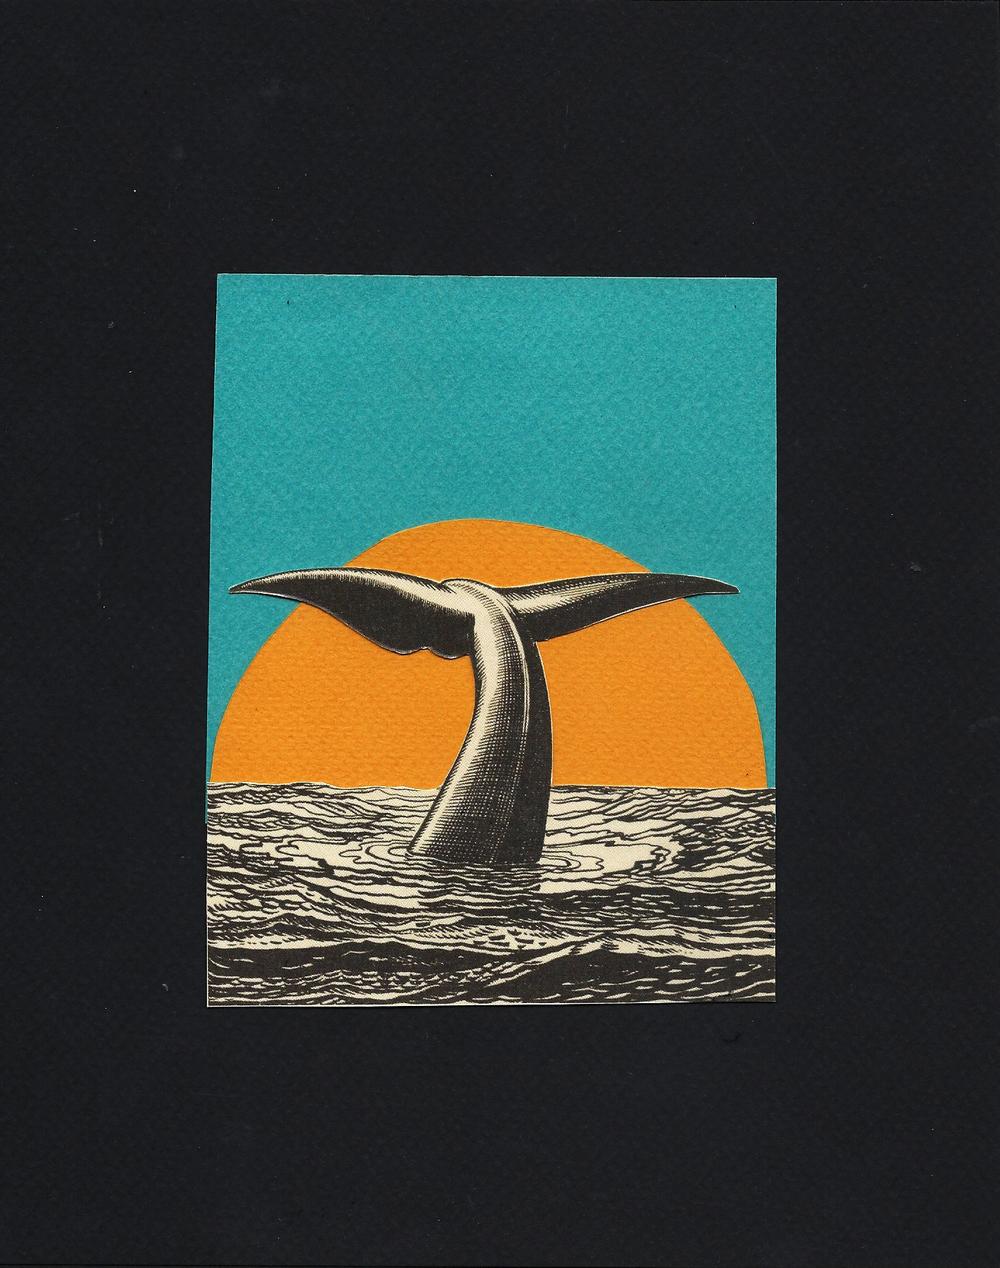 WhaleMoonCollage.jpg